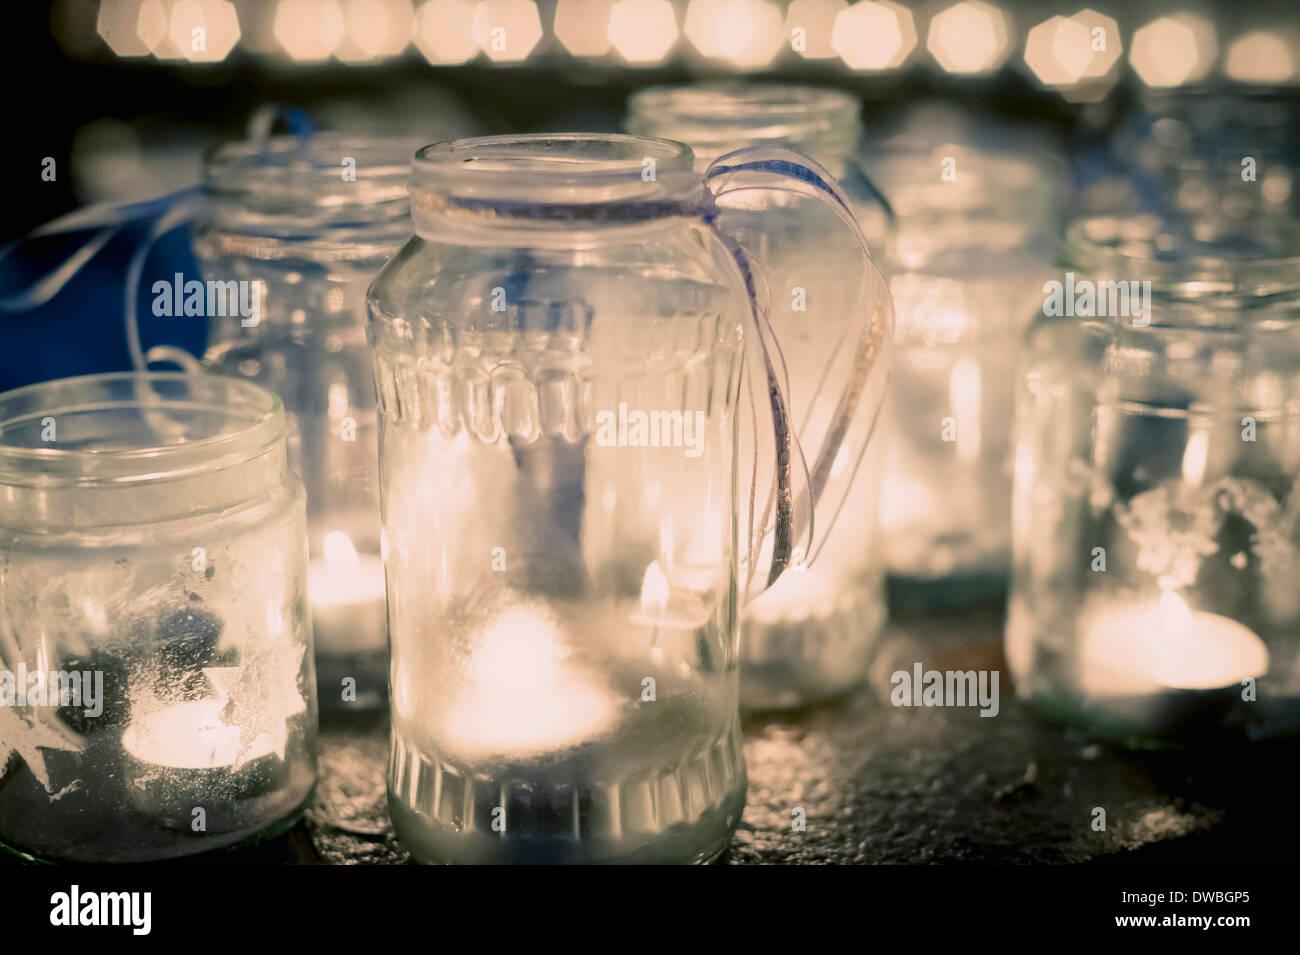 Viele Teelichter in Gläser Stockbild